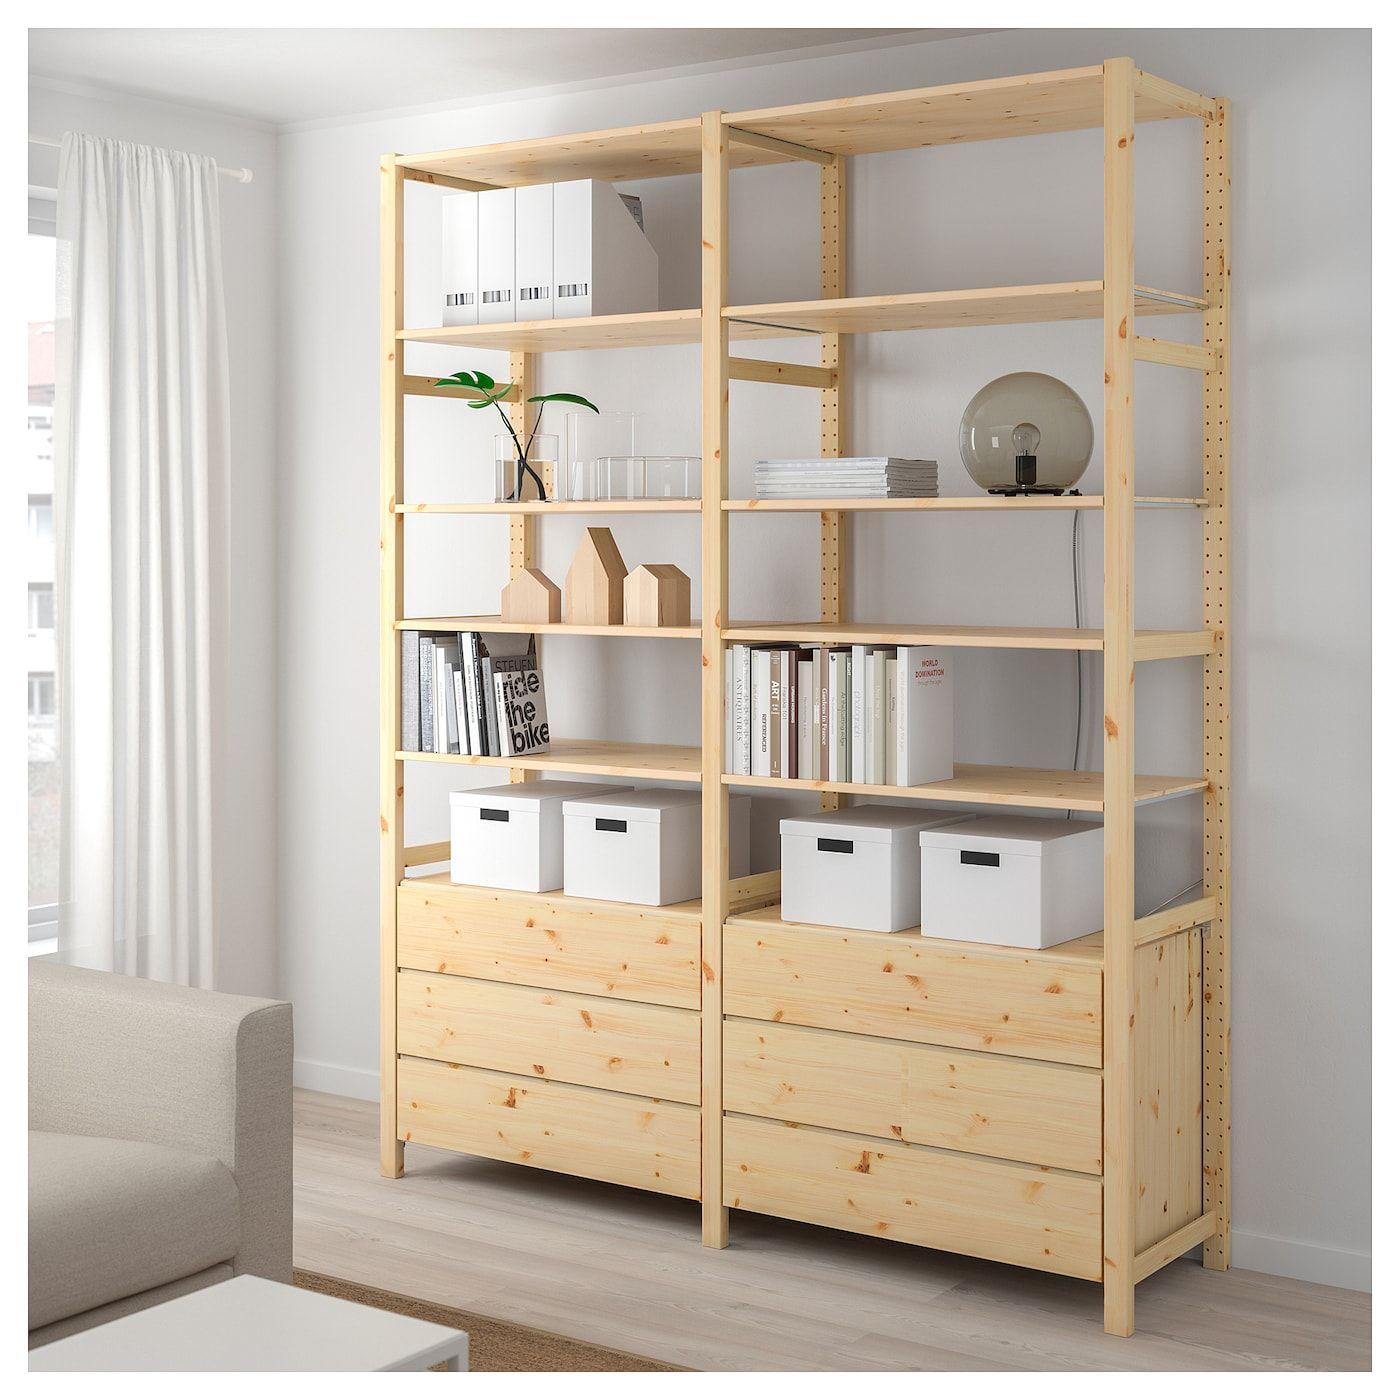 Ivar 2 Elem Boden Kommode Kiefer Ikea Osterreich In 2020 Shelving Unit Shelving Shelves